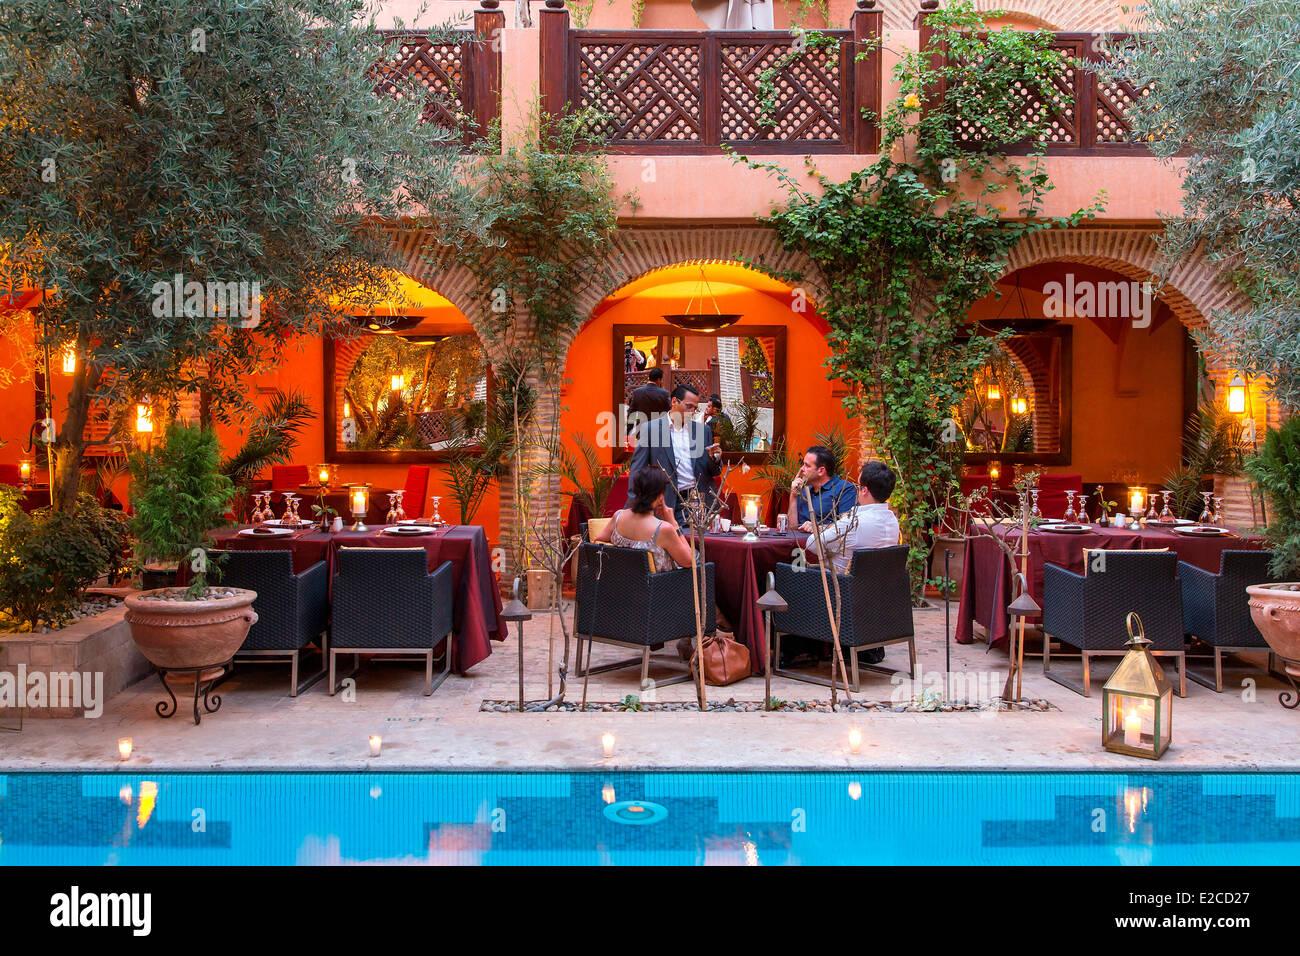 Morocco high atlas marrakesh imperial city restaurant for Architecture maison arabe